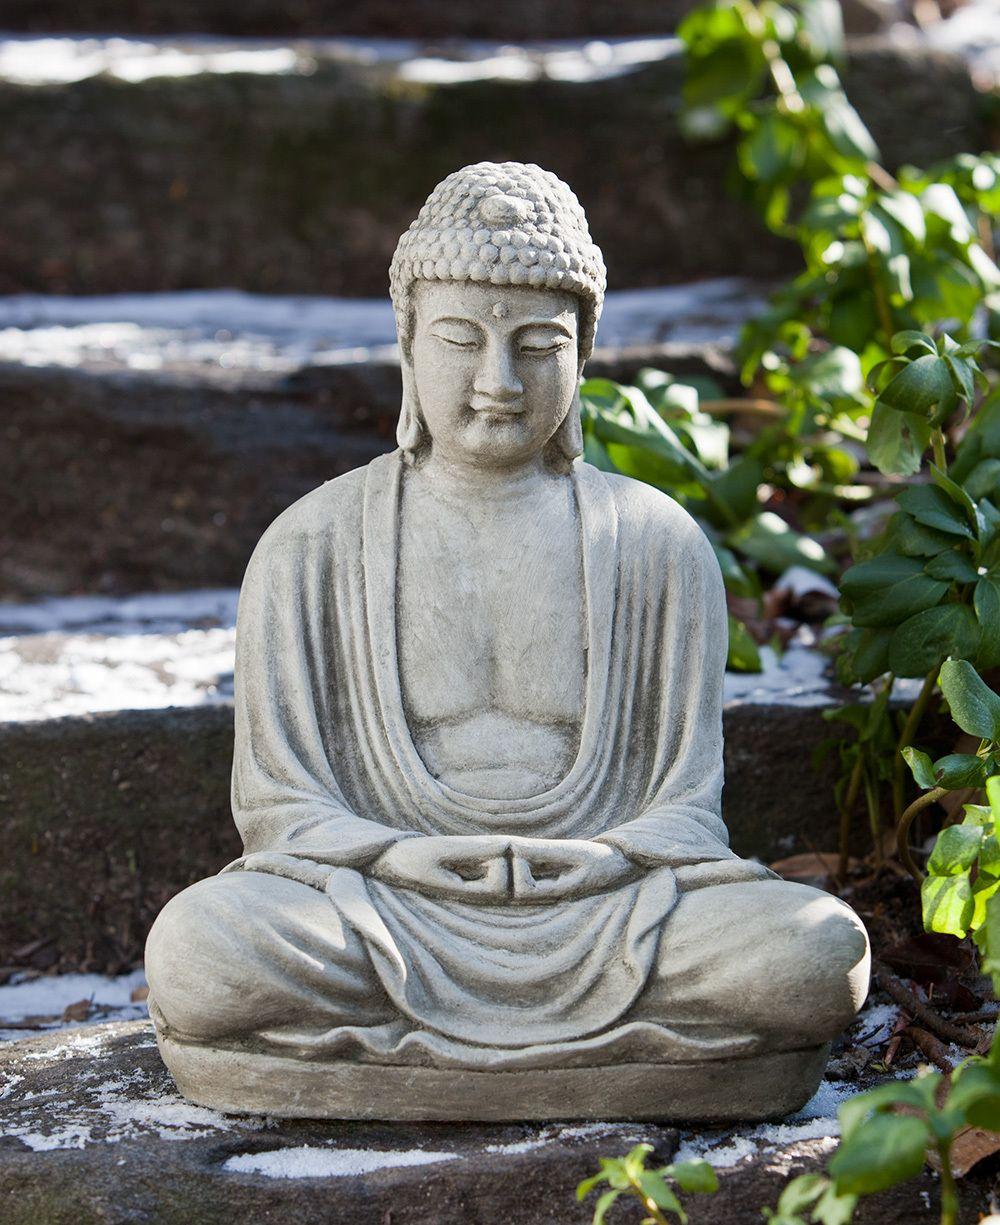 Great Stone Buddha Garden Statue, USA